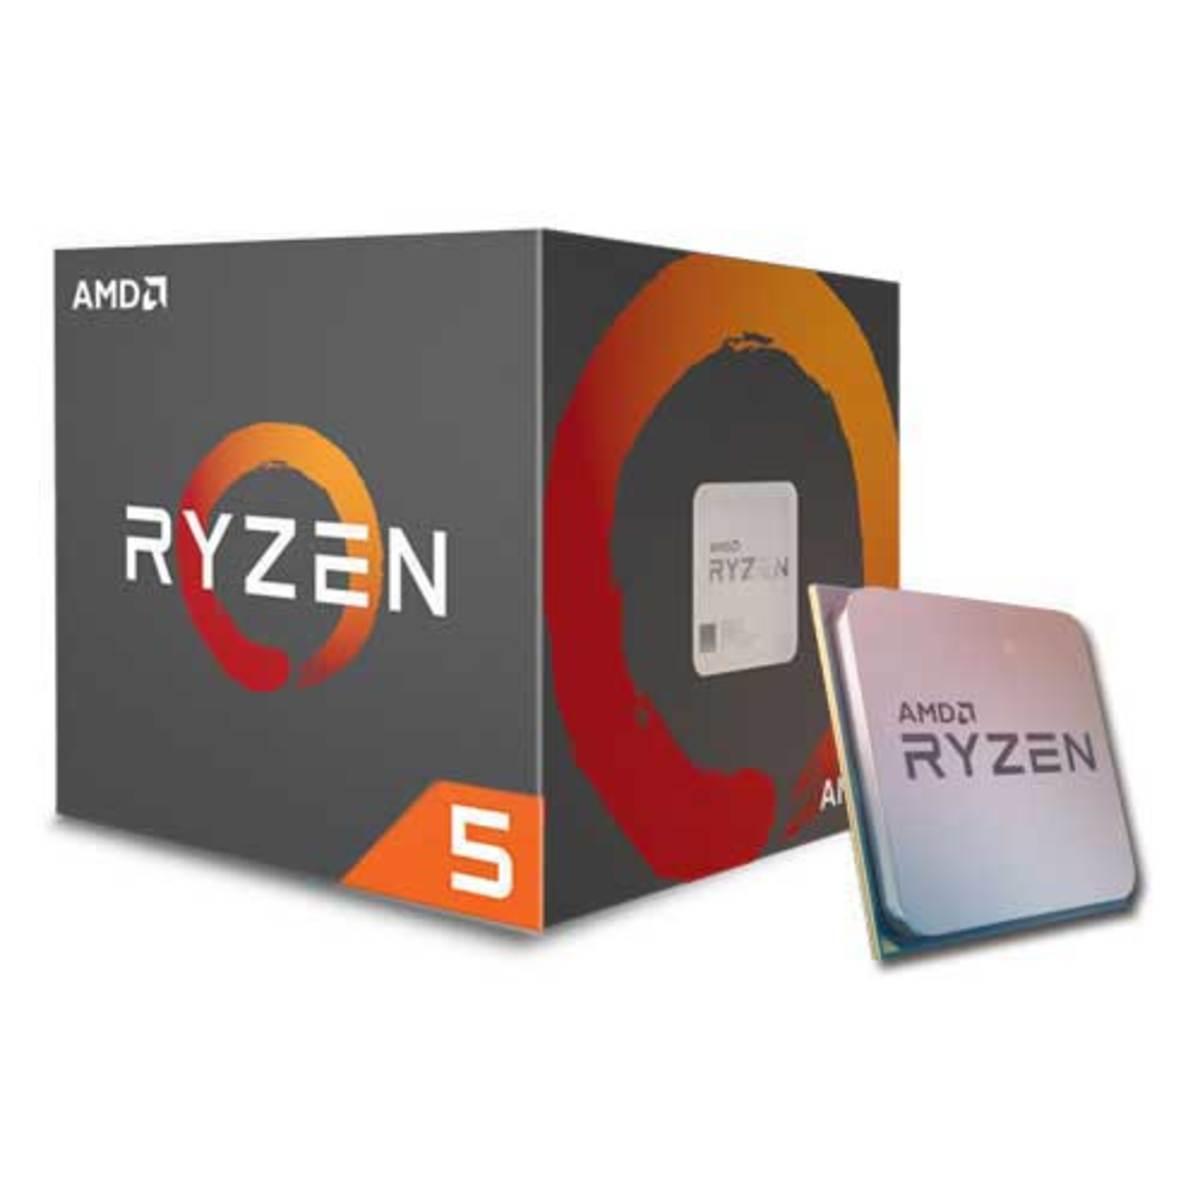 November 2017 AMD Ryzen Gaming PC Build